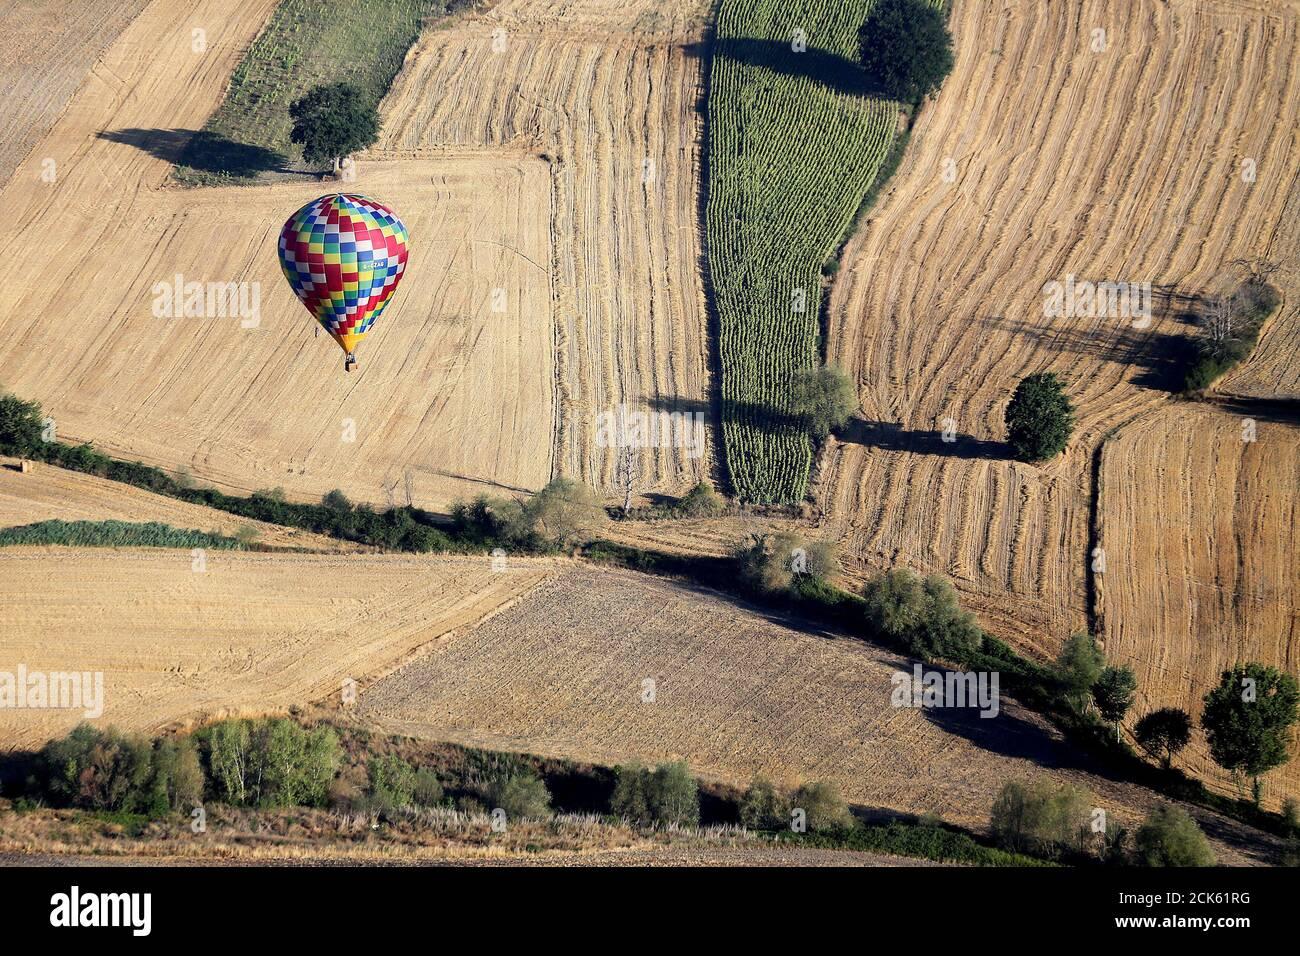 Ein Heißluftballon fliegt während einer Heißluftballonfahrt in Todi, Italien, am 29. Juli 2017. REUTERS/Alessandro Bianchi Stockfoto